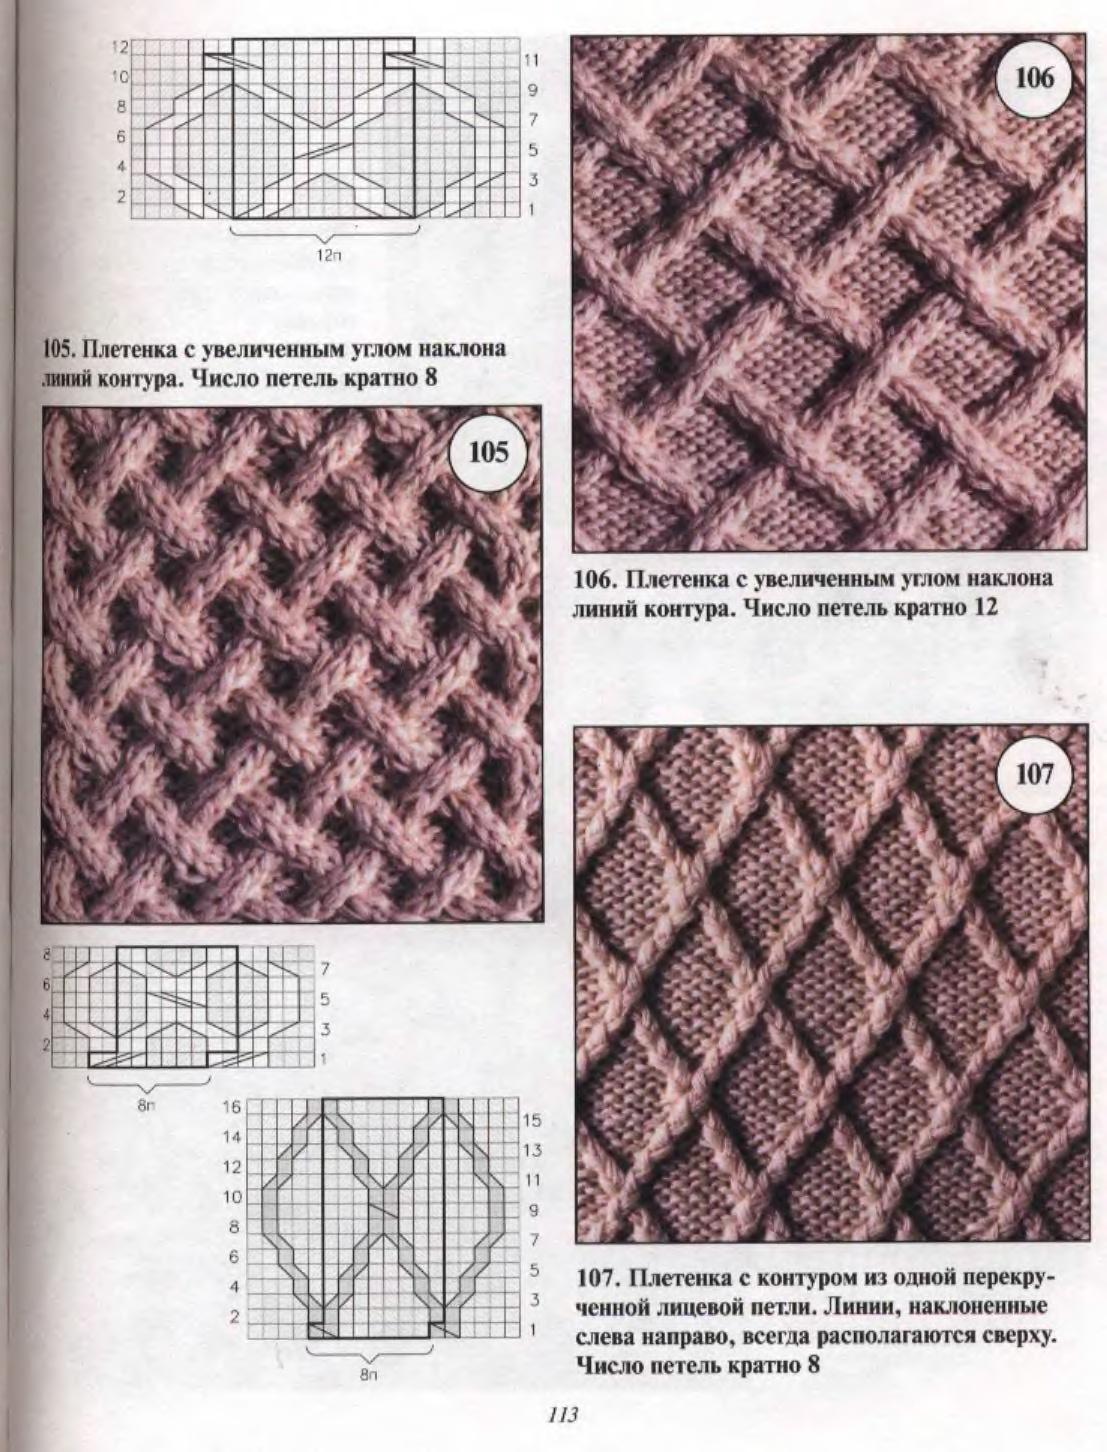 плетенка схема с описанием